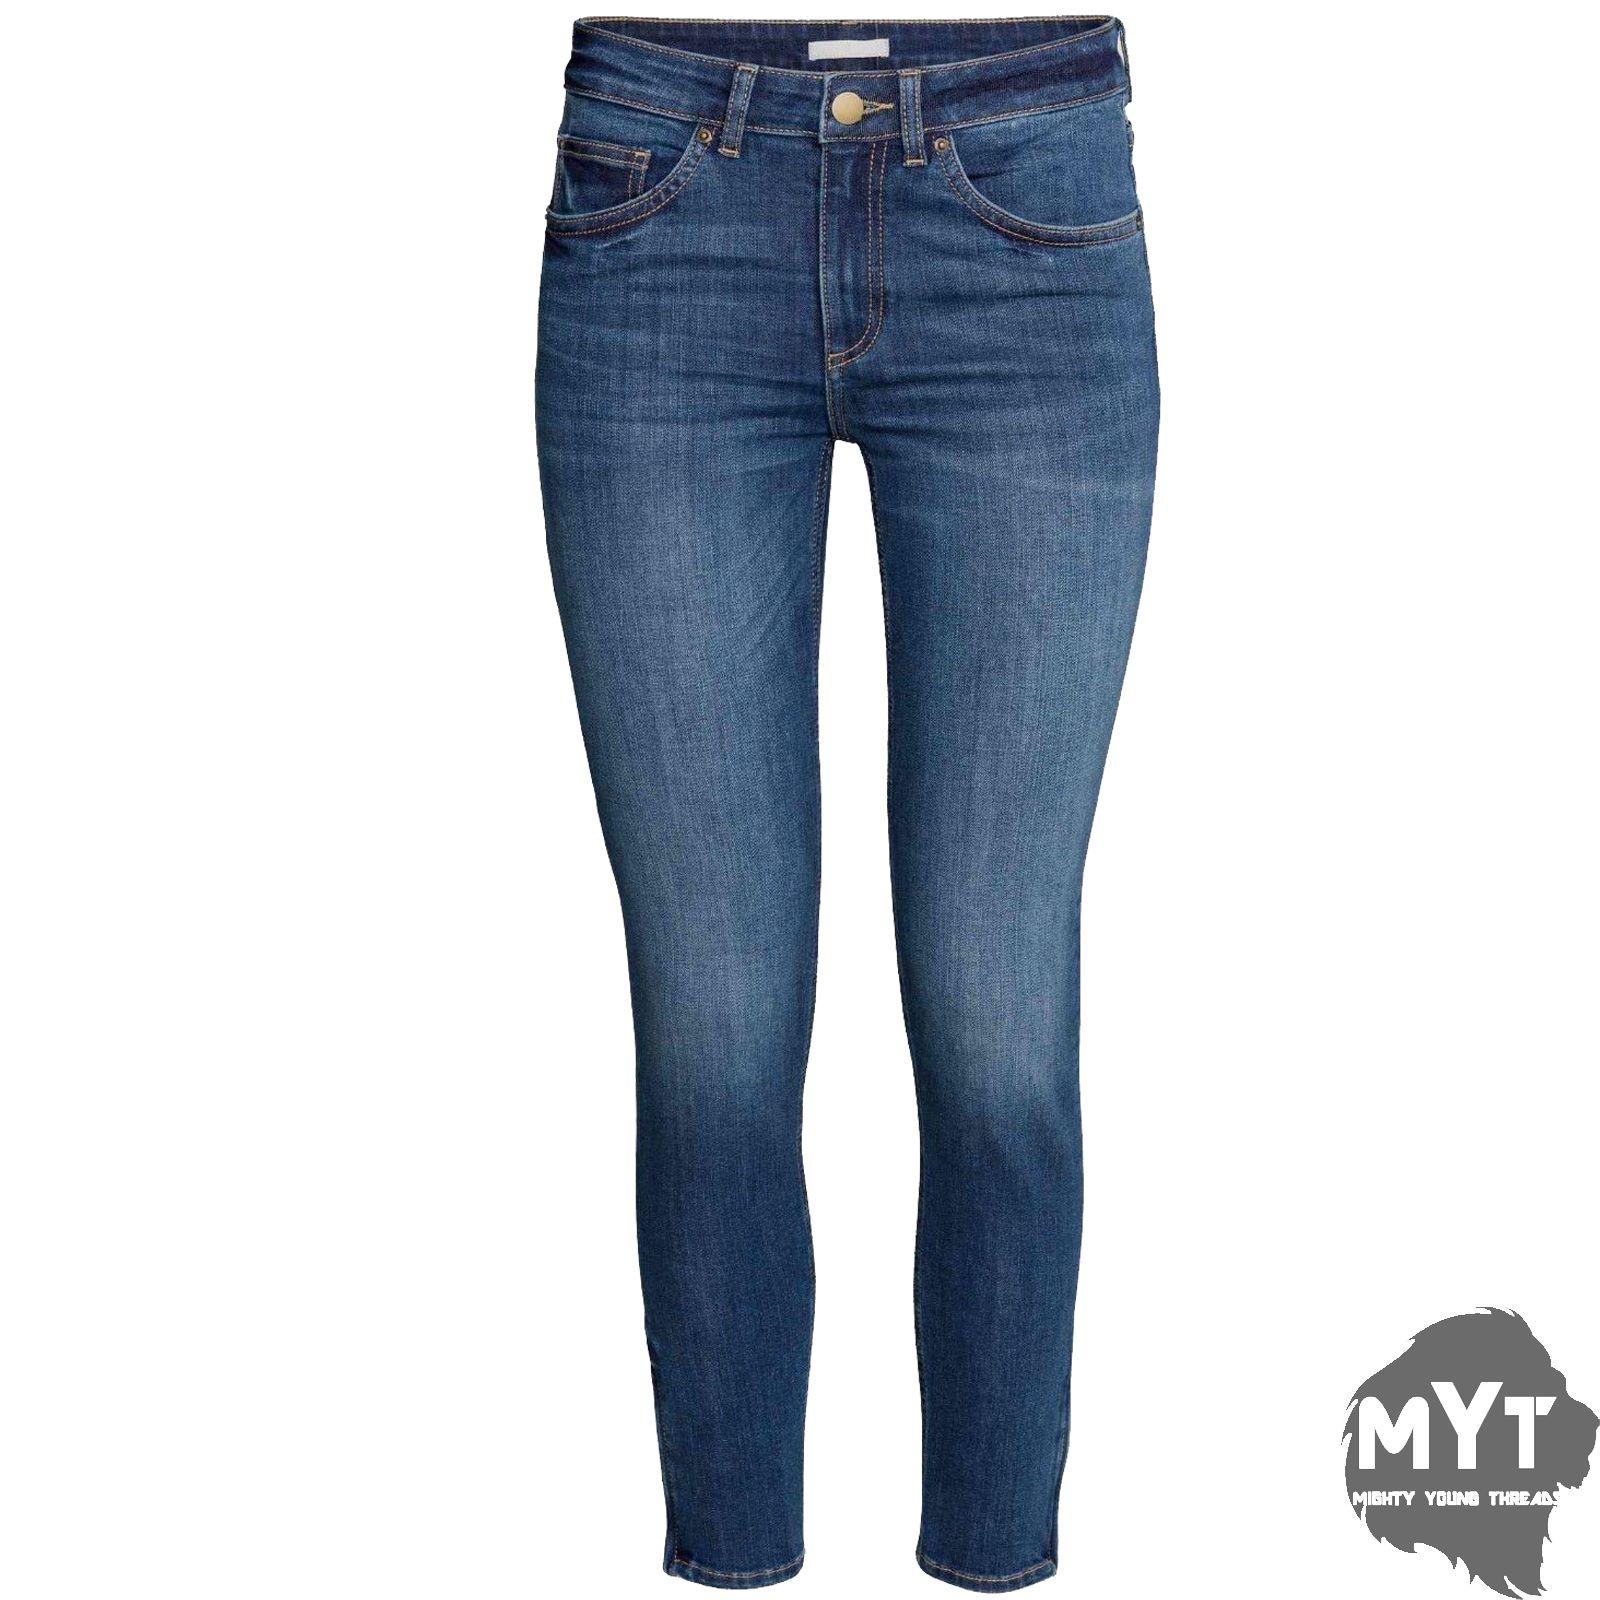 "Ladies Zara jeans Womans Jeans Denim Trouser Jeans All Sizes Leg Length 30/"" NEW"